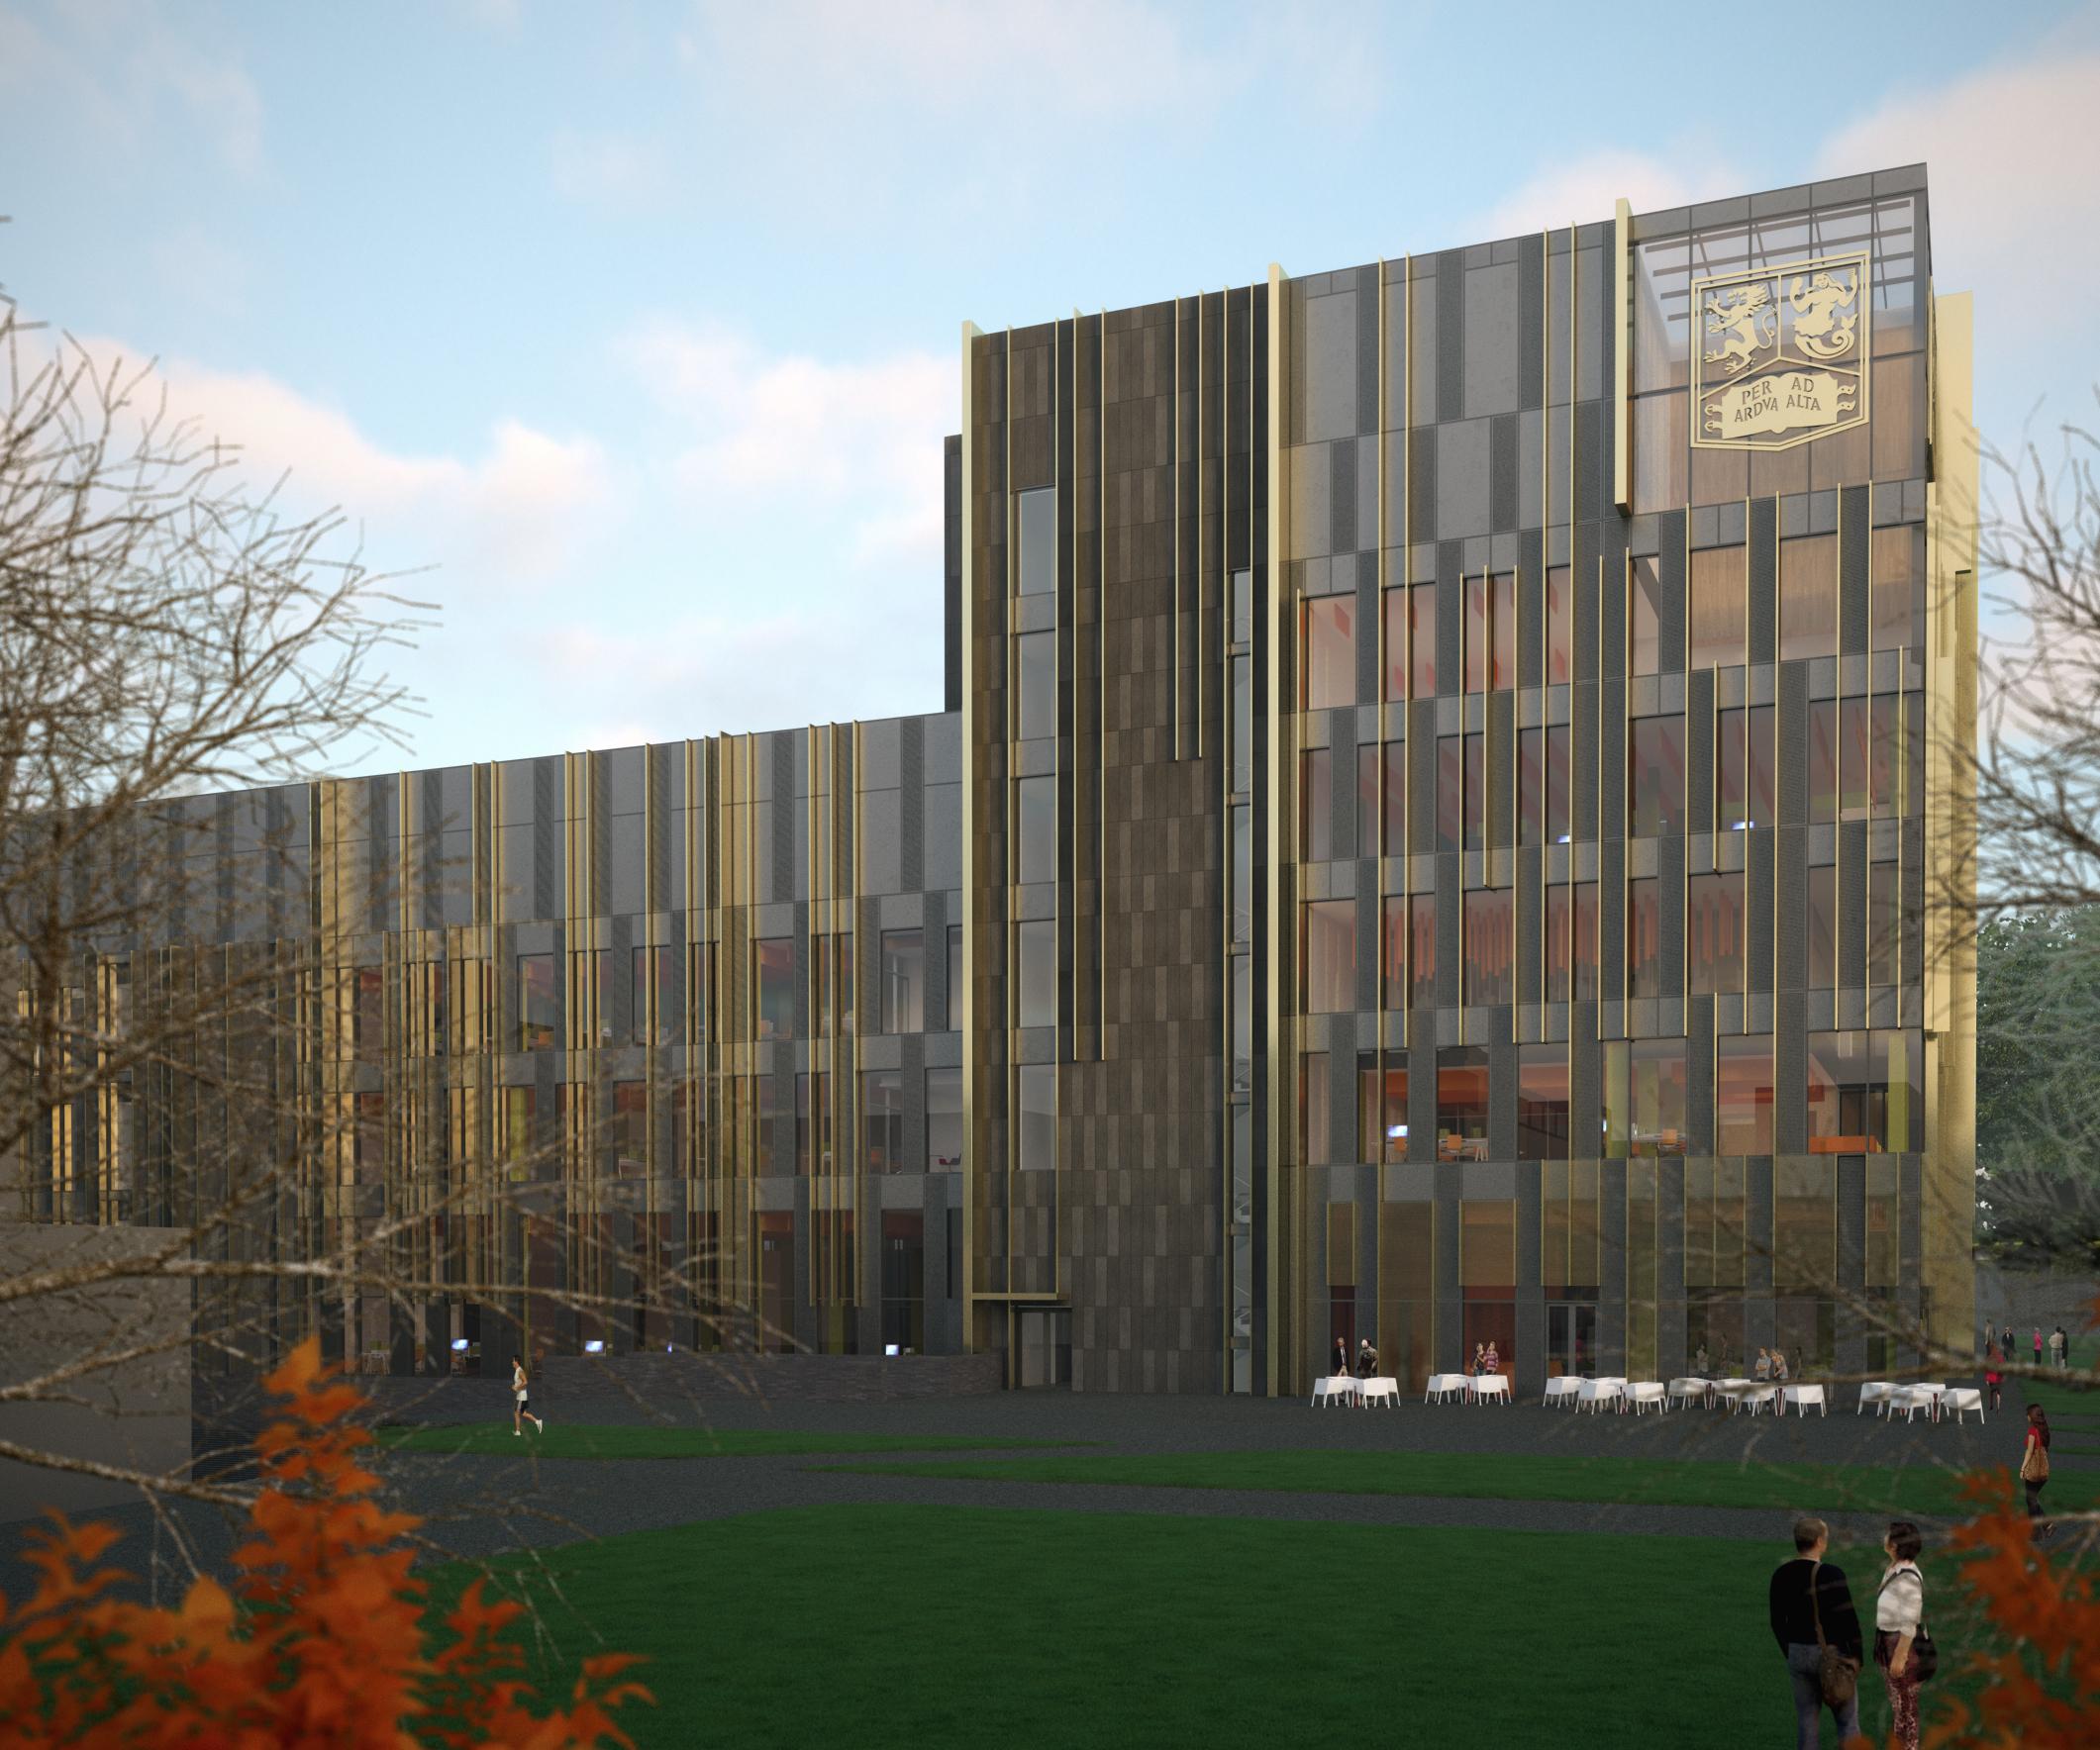 Dissertation Proposal Service University Of Birmingham